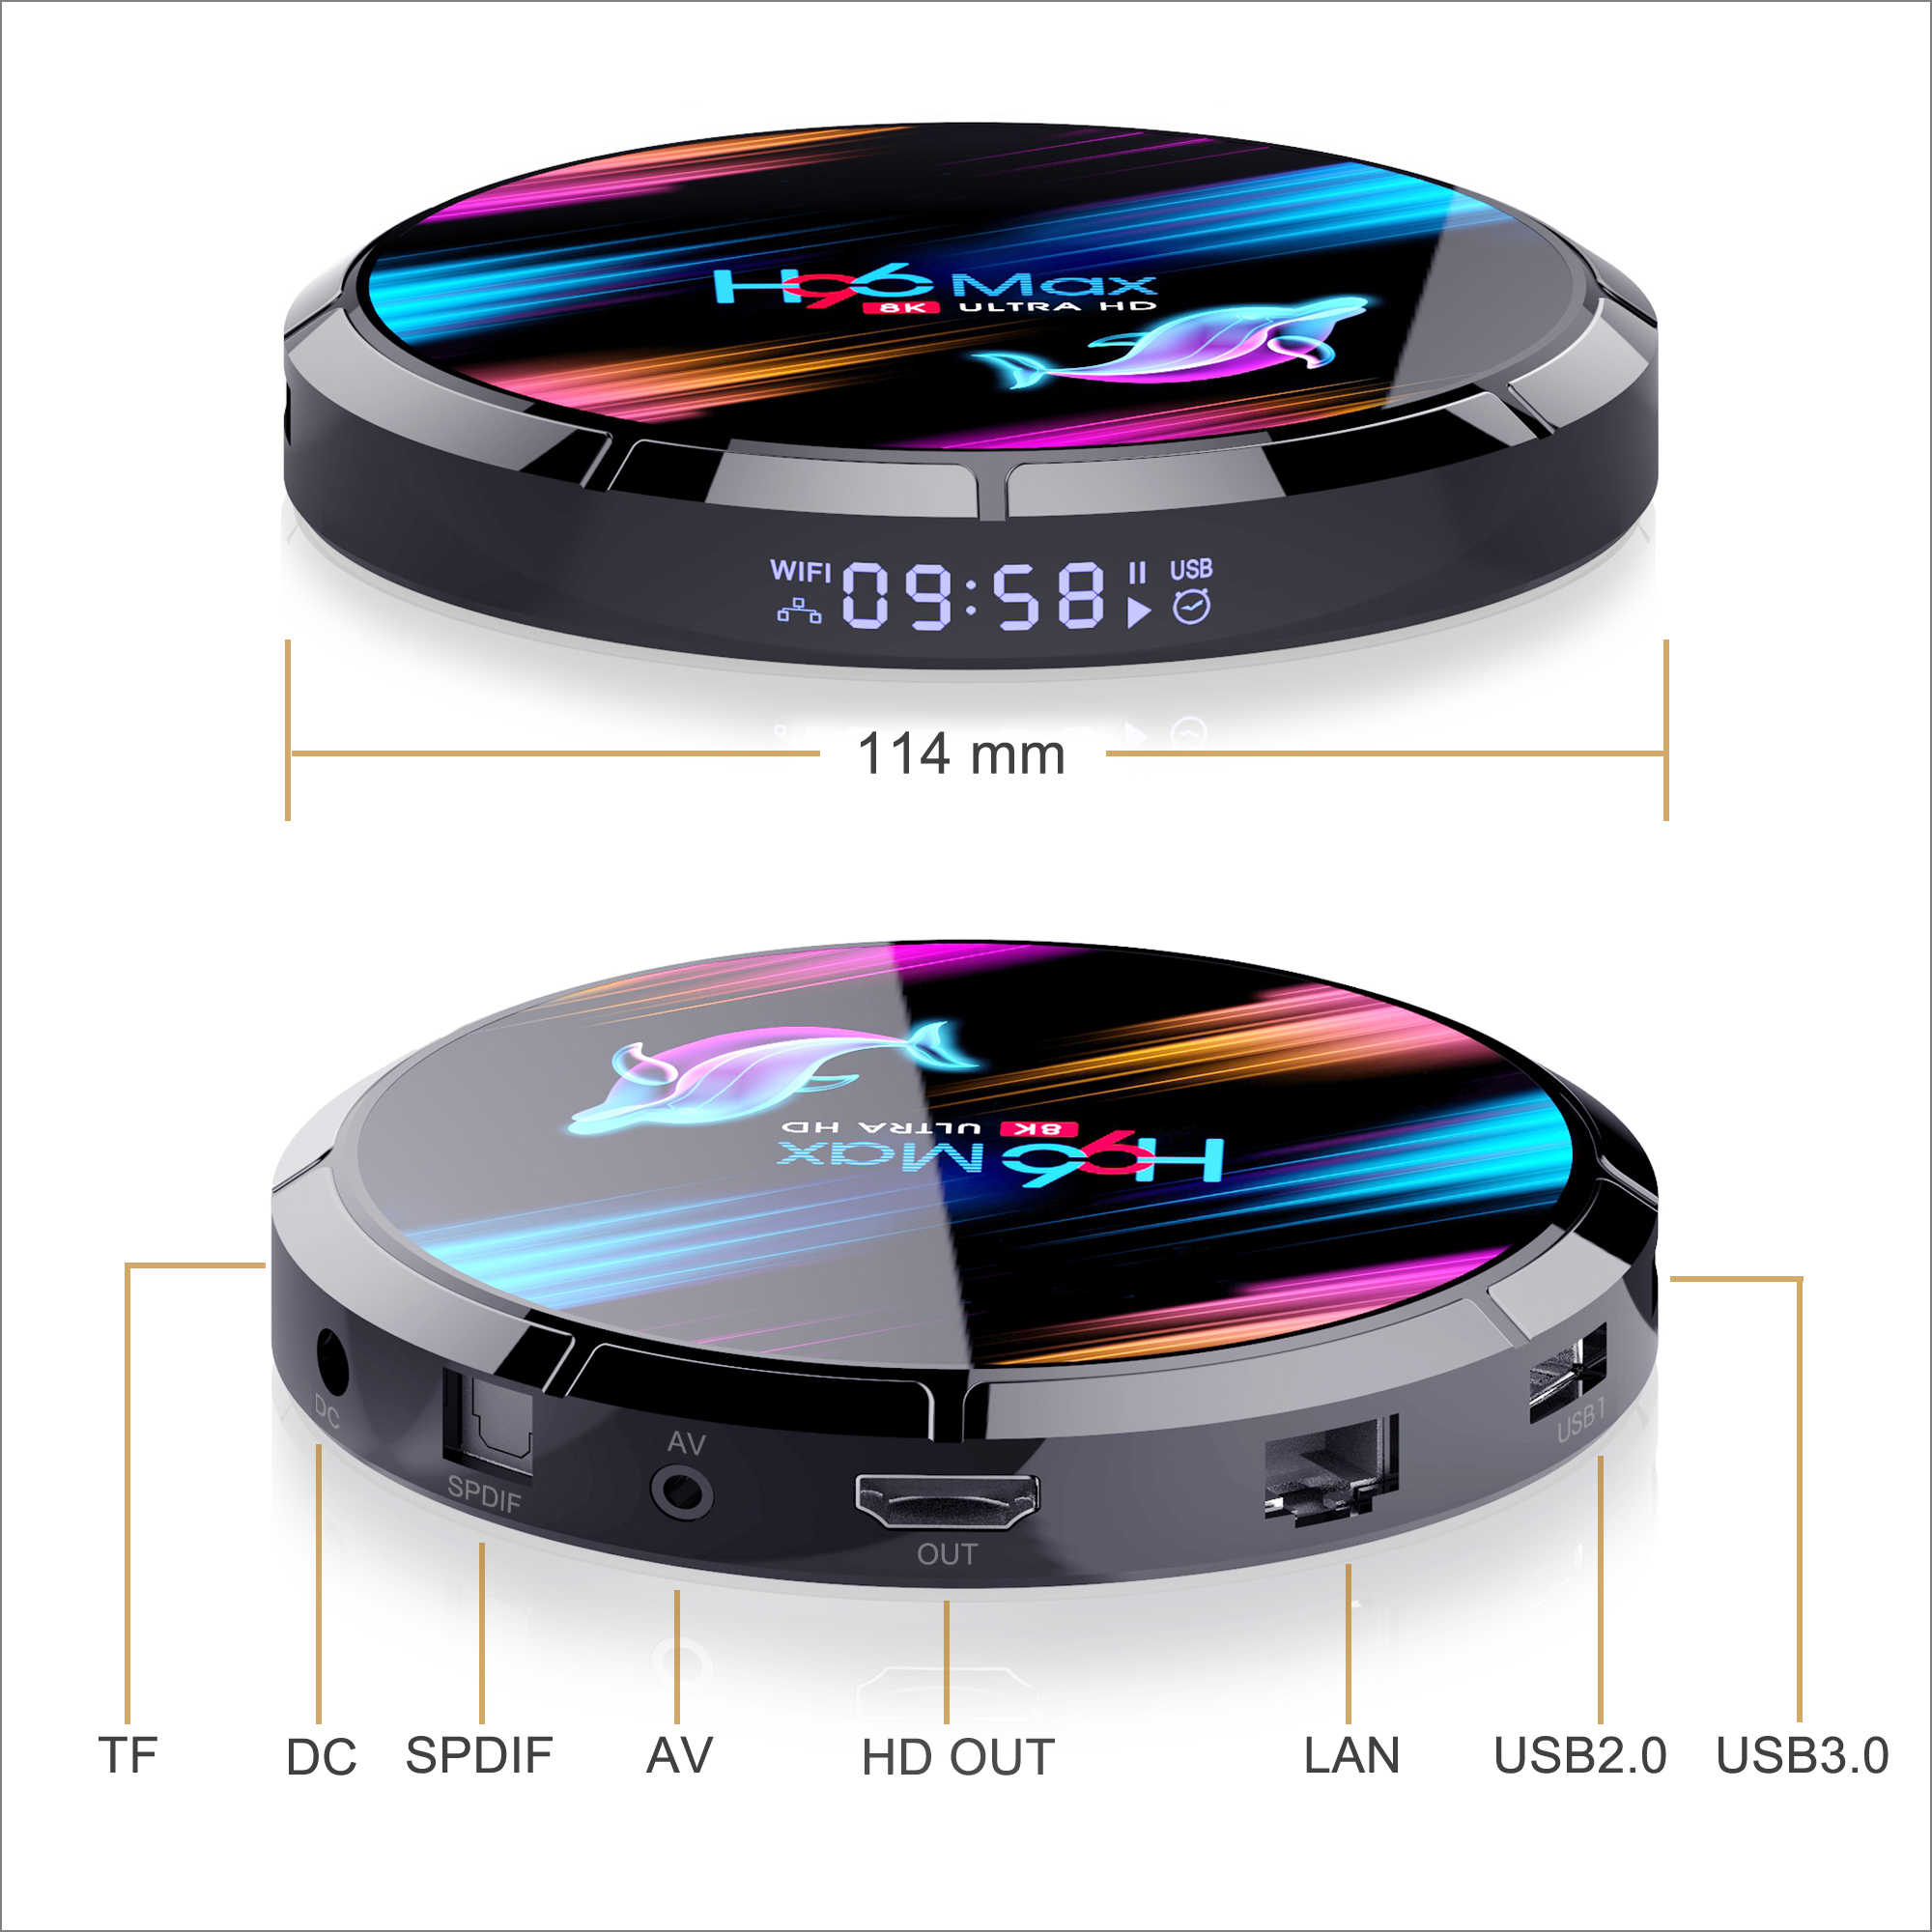 LEMFO TV kutusu S905X3 Android 9.0 8K akıllı tv kutusu 4GB 64GB HDMI 2.1 LAN 1000M 2.4G/5G WIFi Netflix Hulu Flixster Youtube SmartBOX